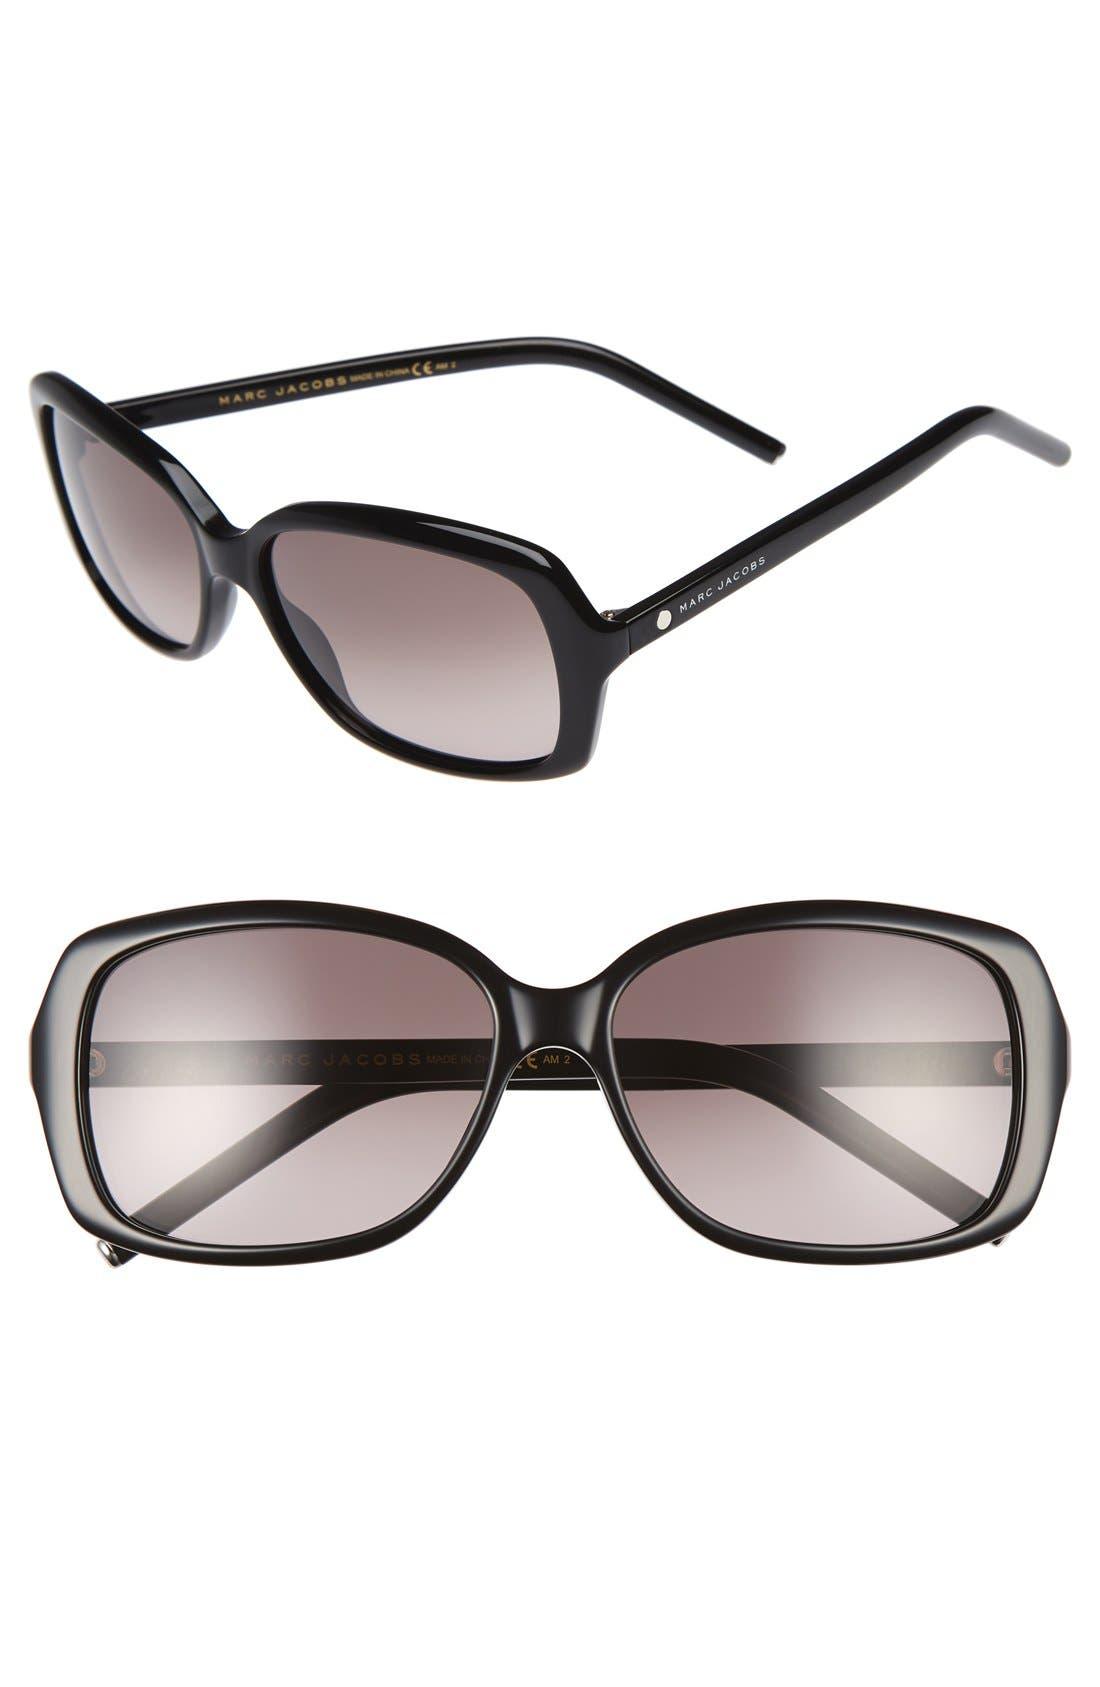 MARC JACOBS 57mm Sunglasses,                             Main thumbnail 1, color,                             Black